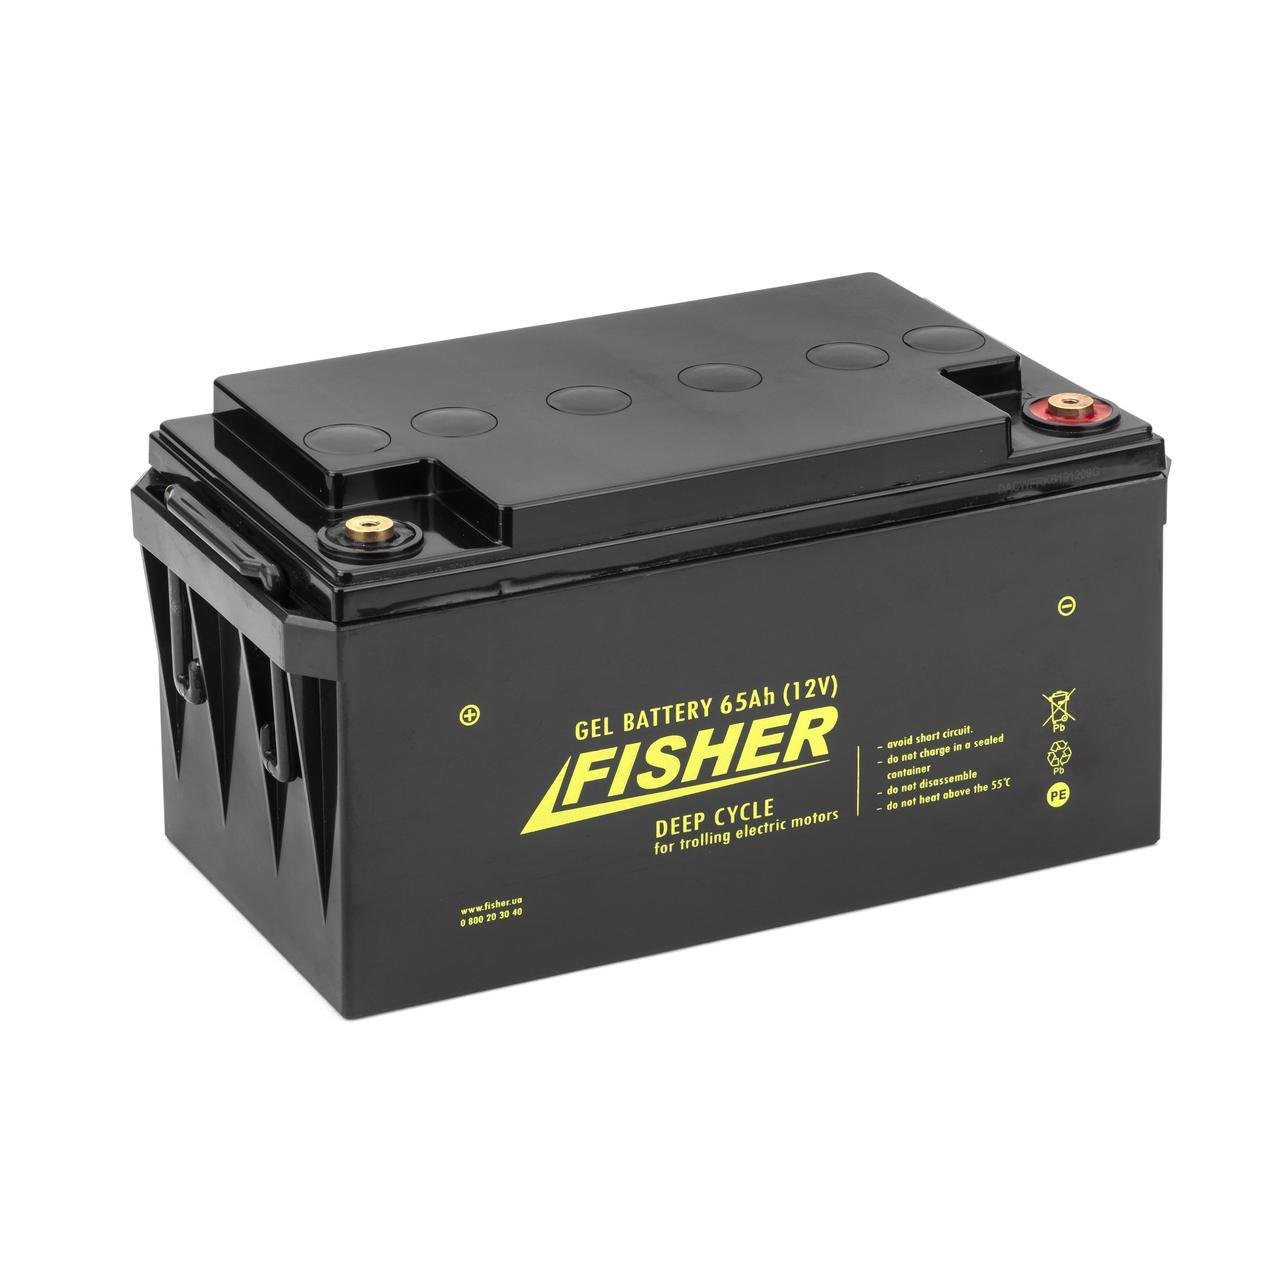 Гелевый аккумулятор для электромотора Fisher 65Ah